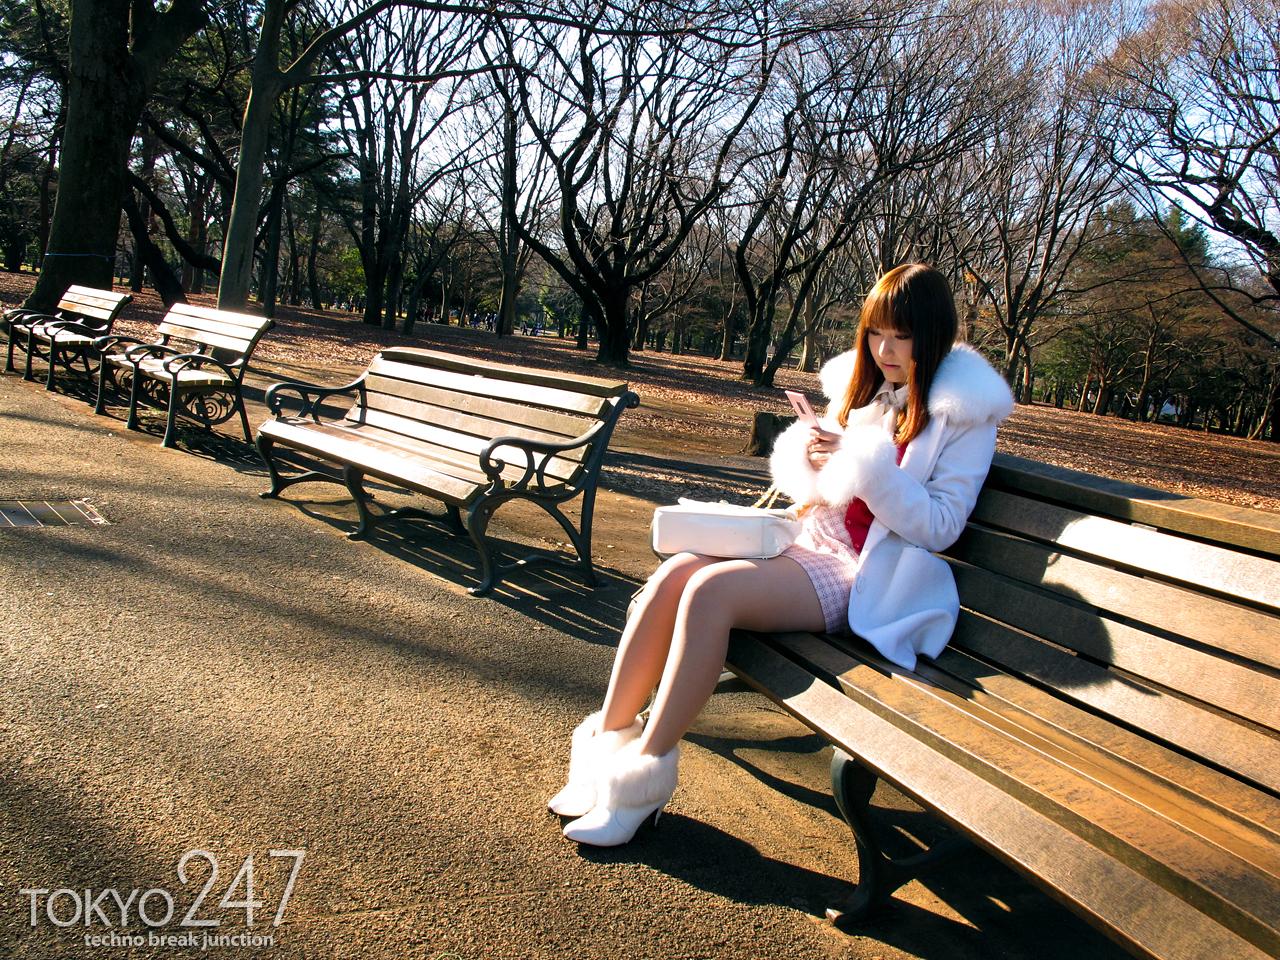 [Tokyo-247] Sayaka_和希さやか - 貼圖 - 性感激情 -